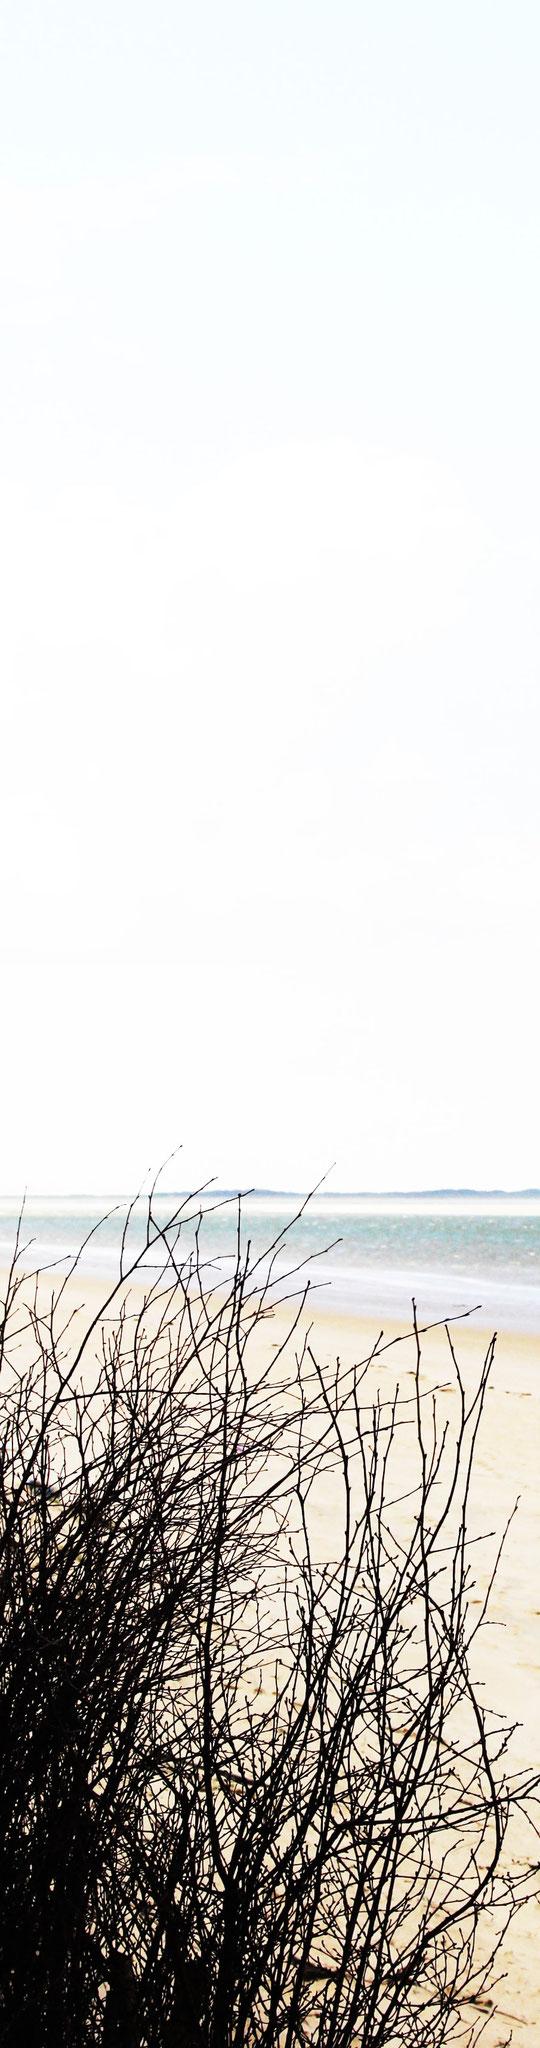 STRAND[büschel] Cape Cod